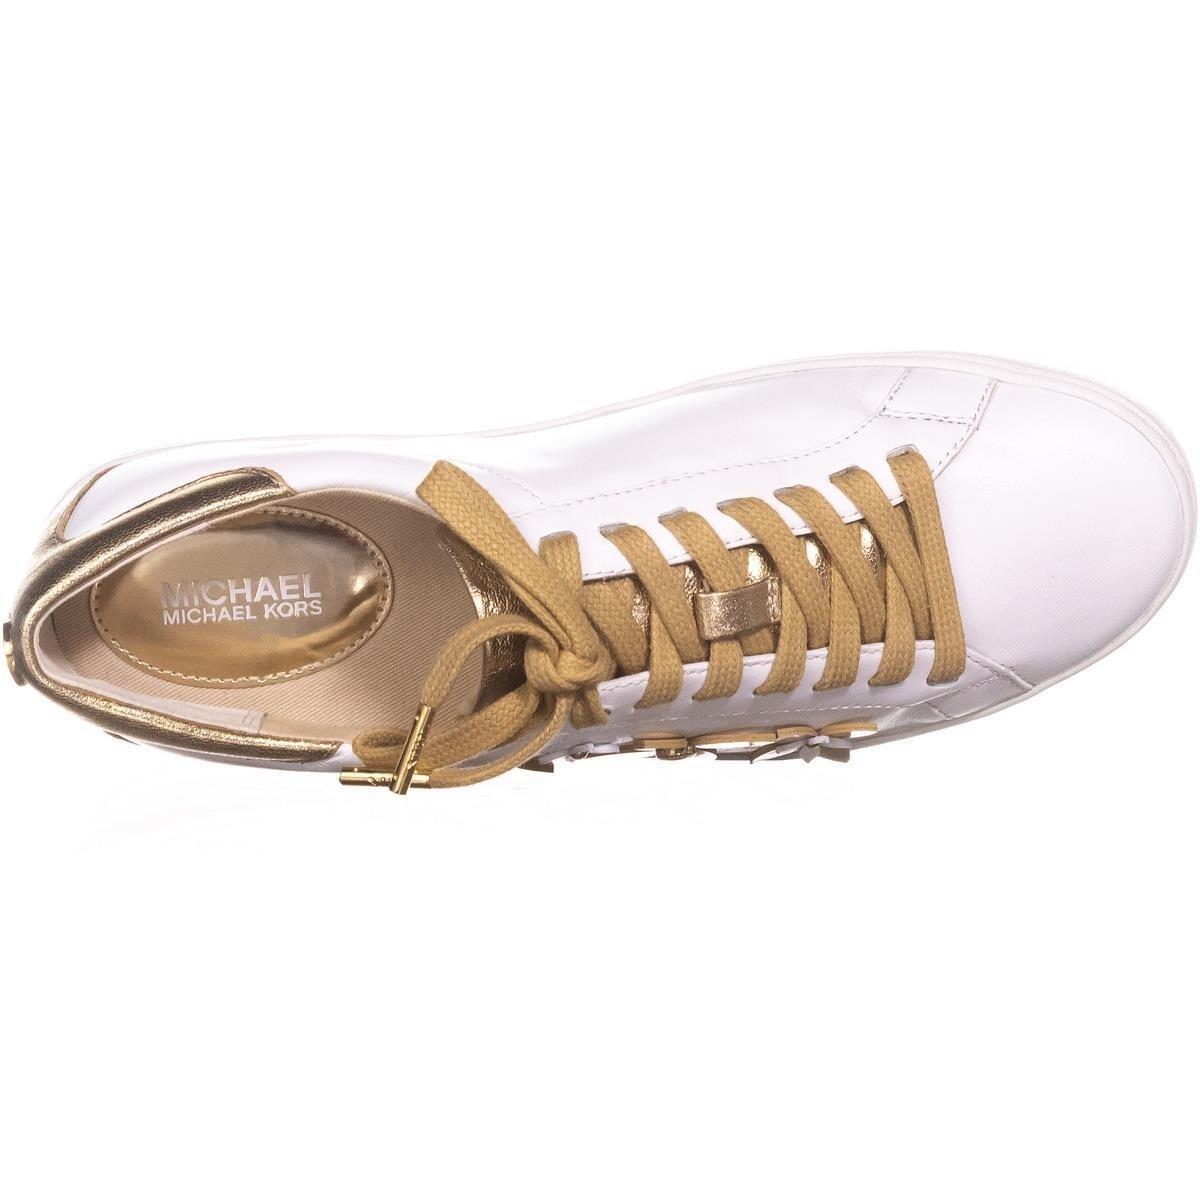 99f6947bed4a Shop MICHAEL Michael Kors Lola Sneaker Flower Fashion Sneakers ...